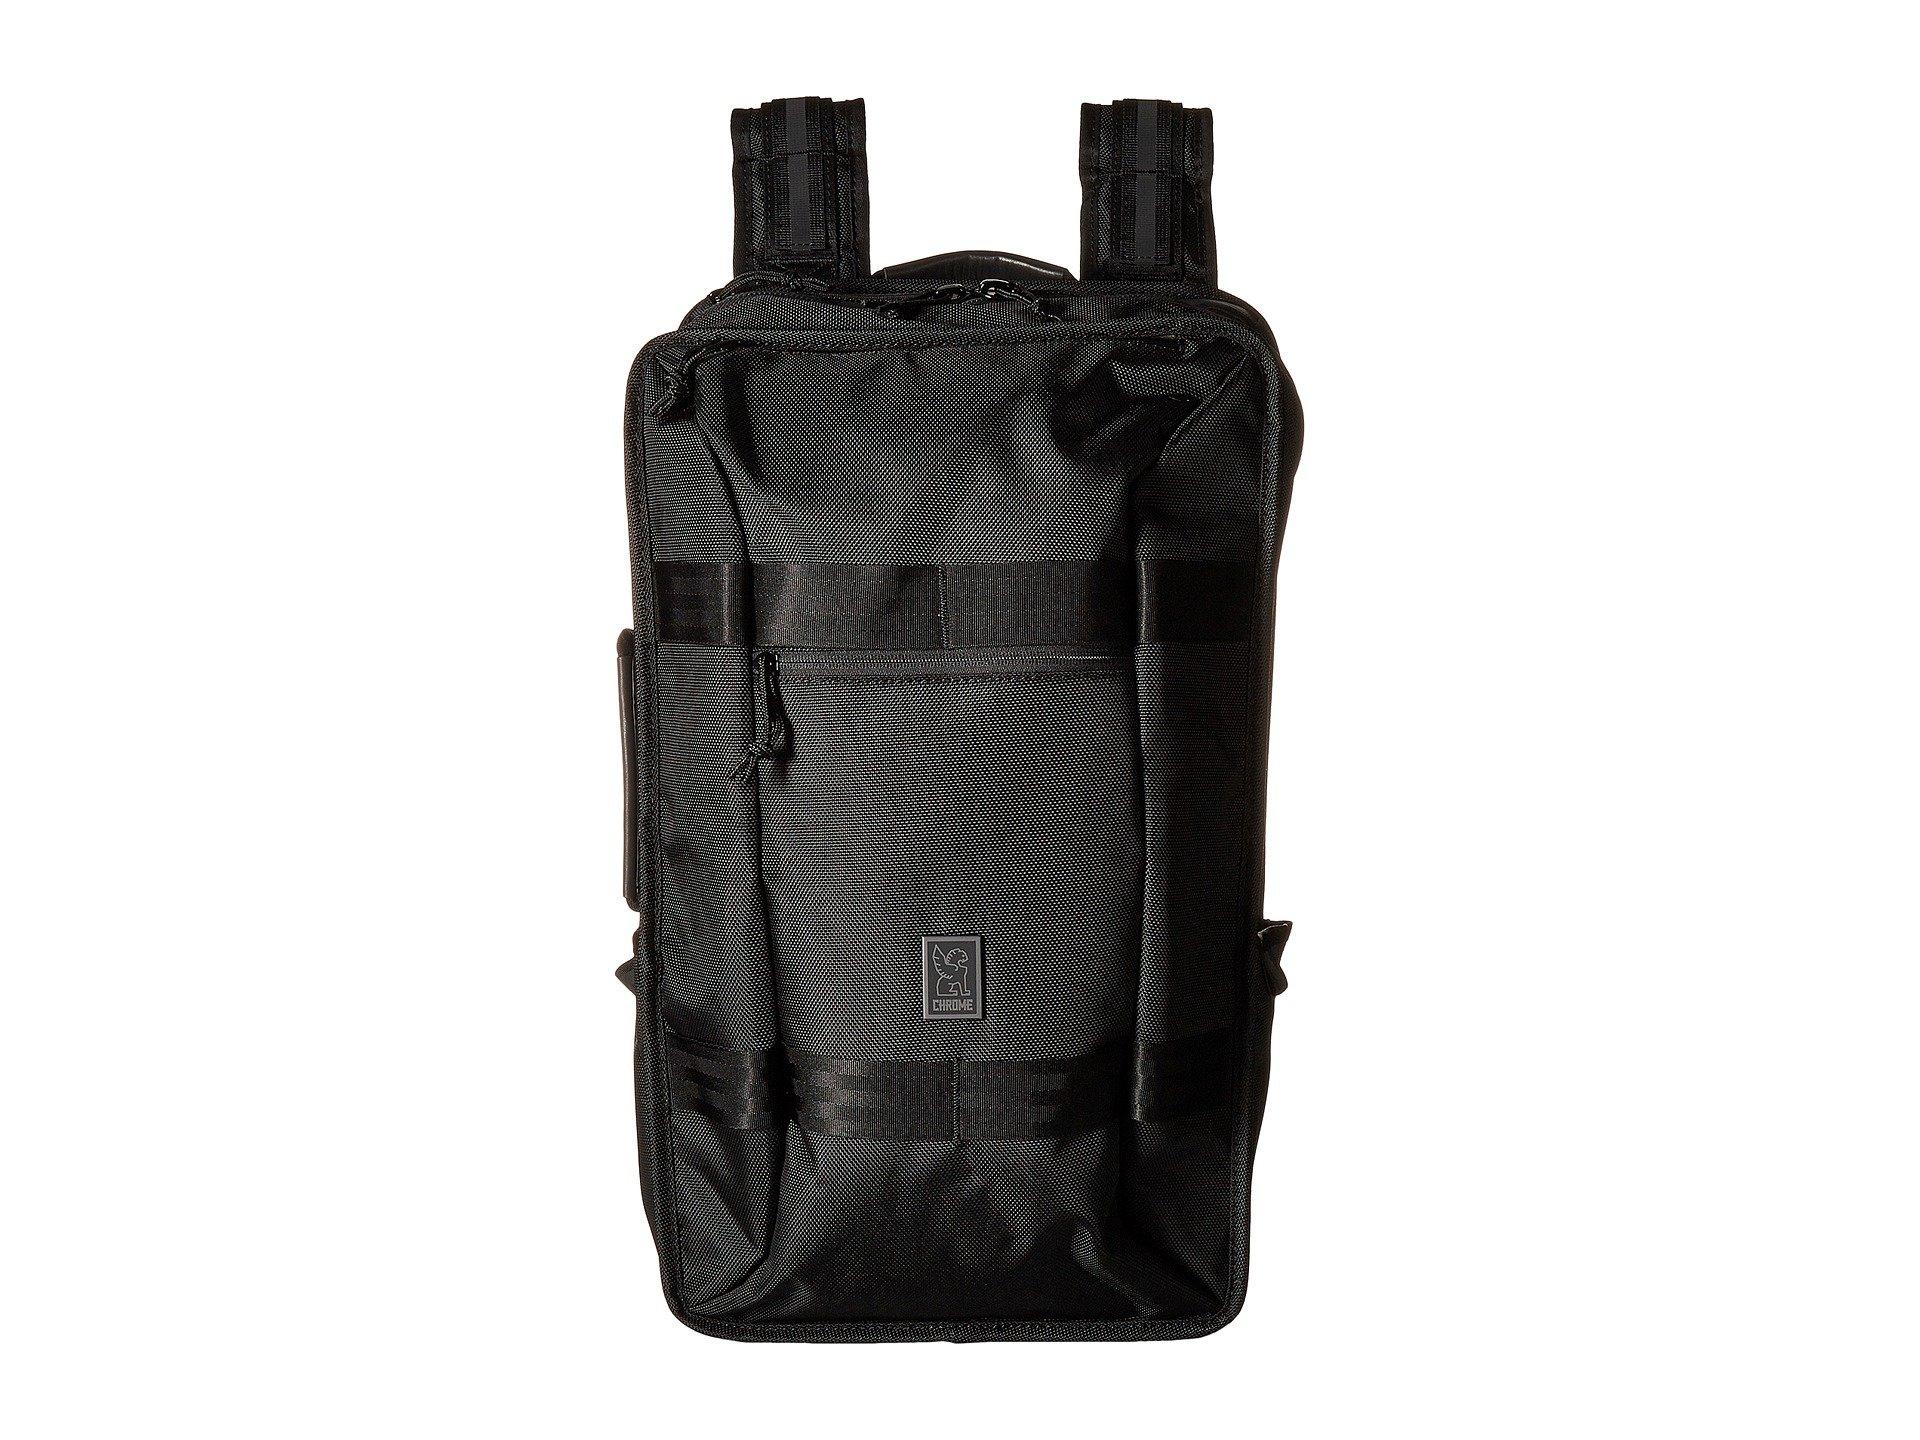 Backpack Black All Backpack Hightower All Chrome Chrome Hightower dwqRxd